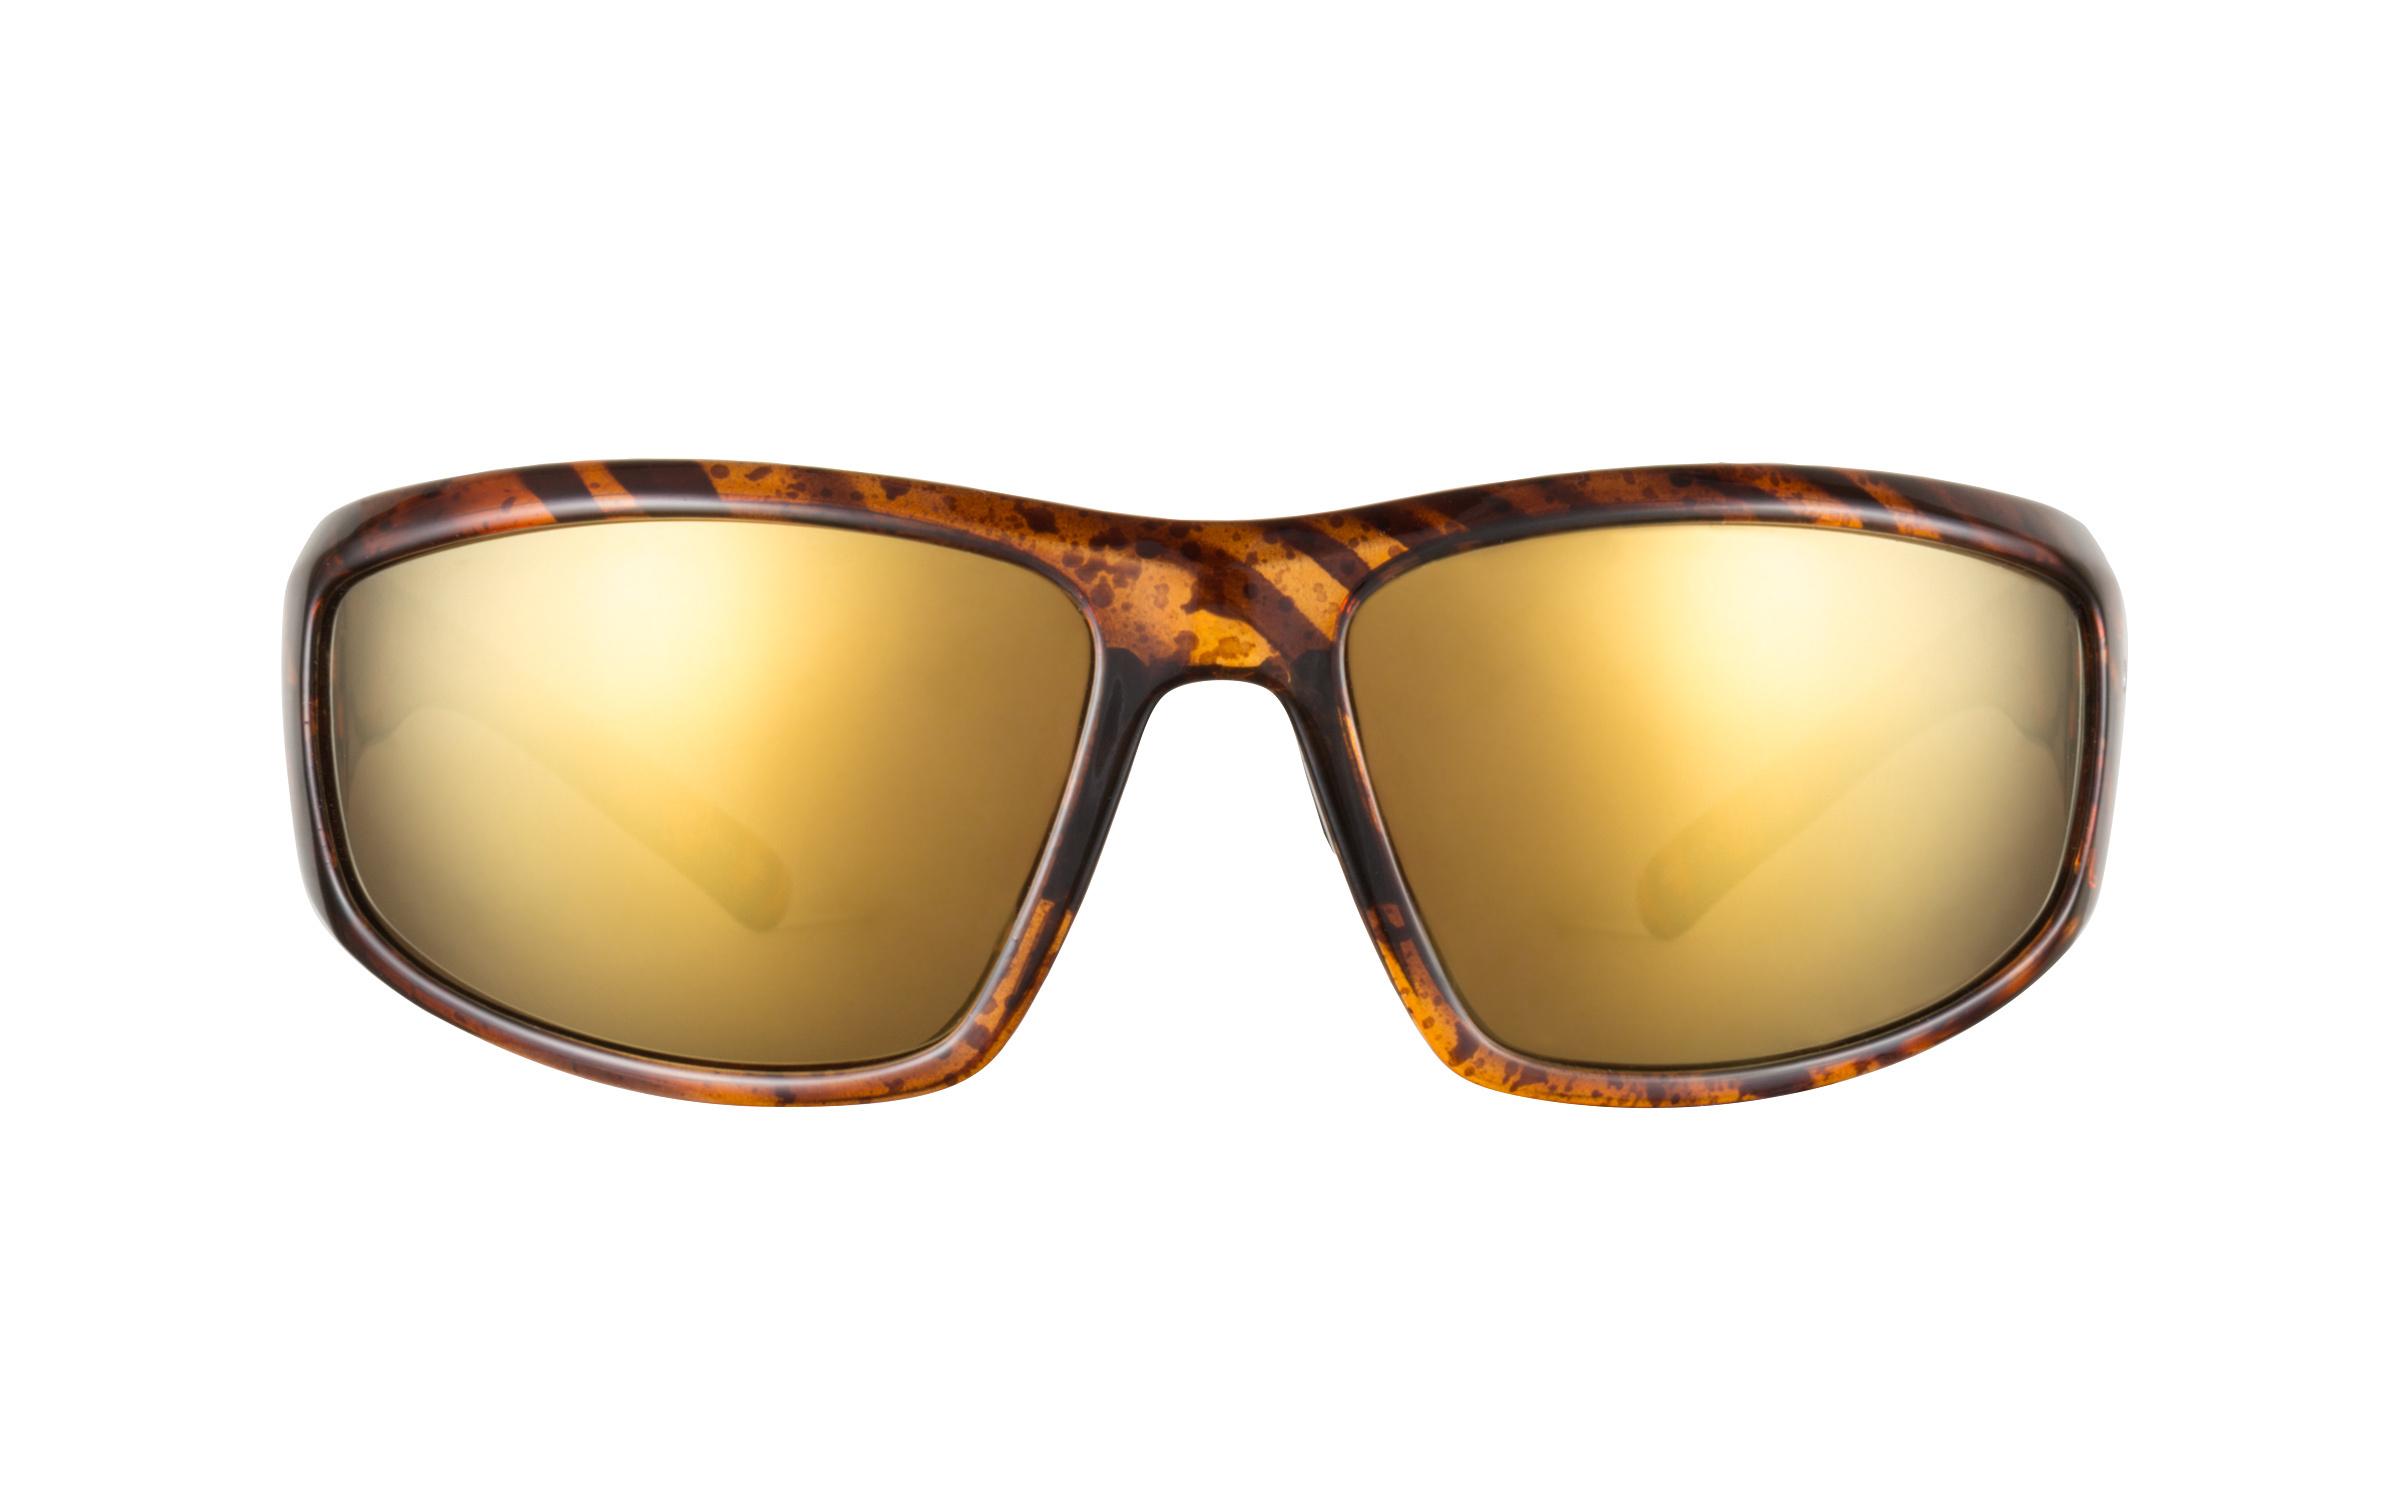 Sporty_Sunglasses_Tortoise_Ryders_Online_Coastal